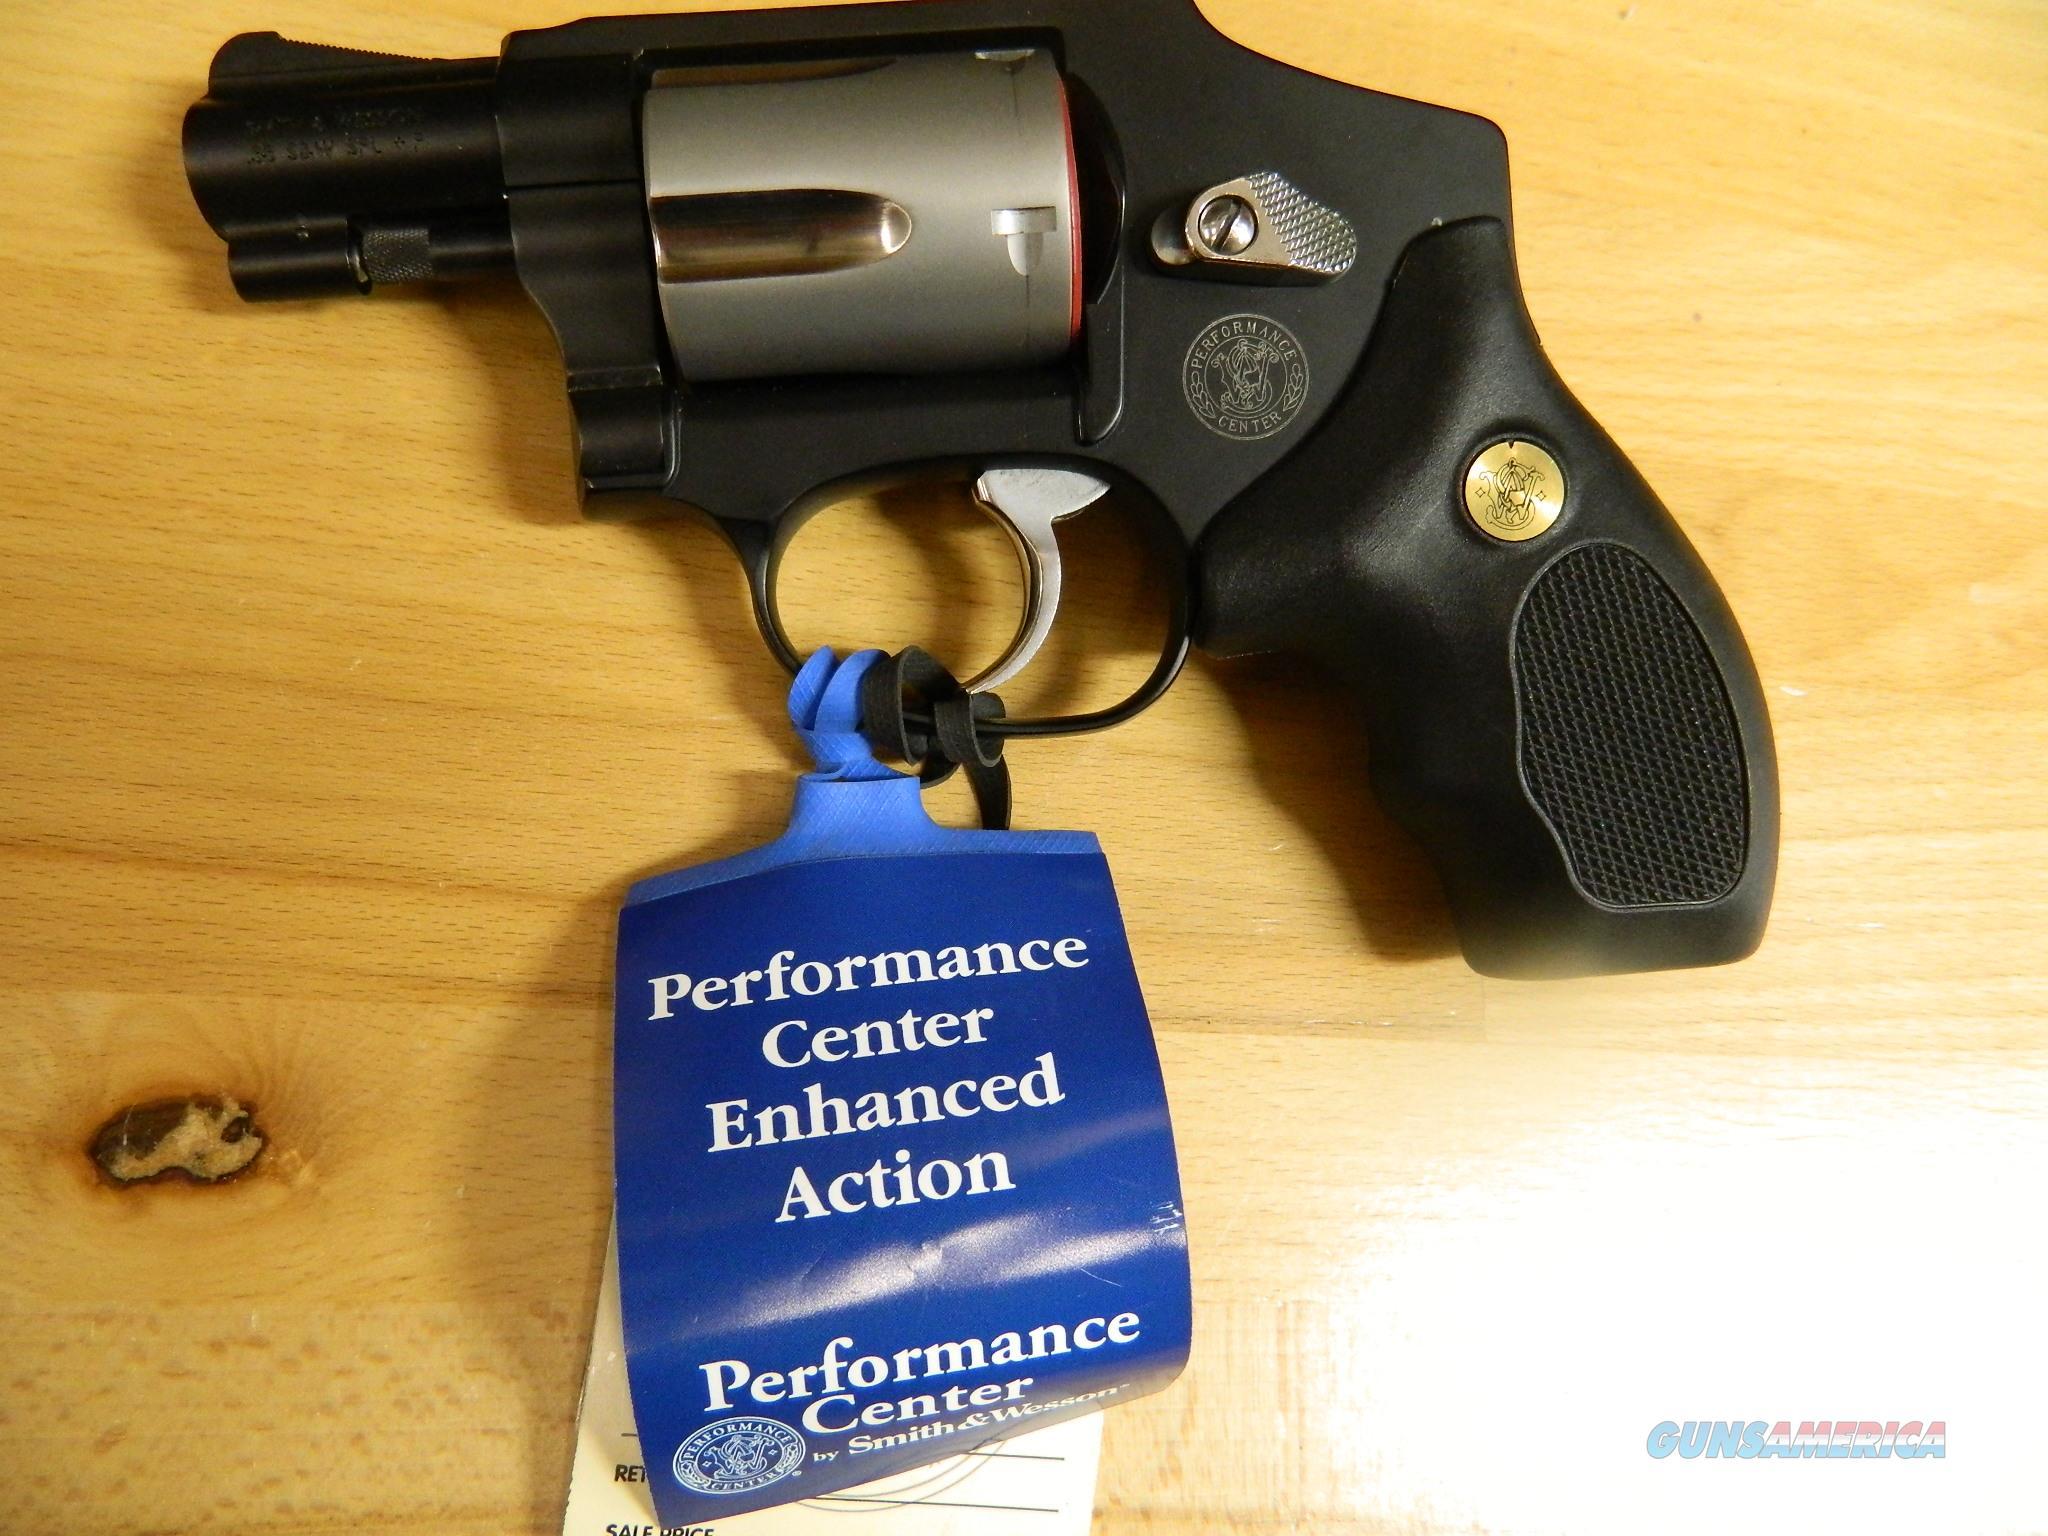 Smith & Wesson 442 Performance Center 38spl +P NIB  Guns > Pistols > Smith & Wesson Revolvers > Performance Center